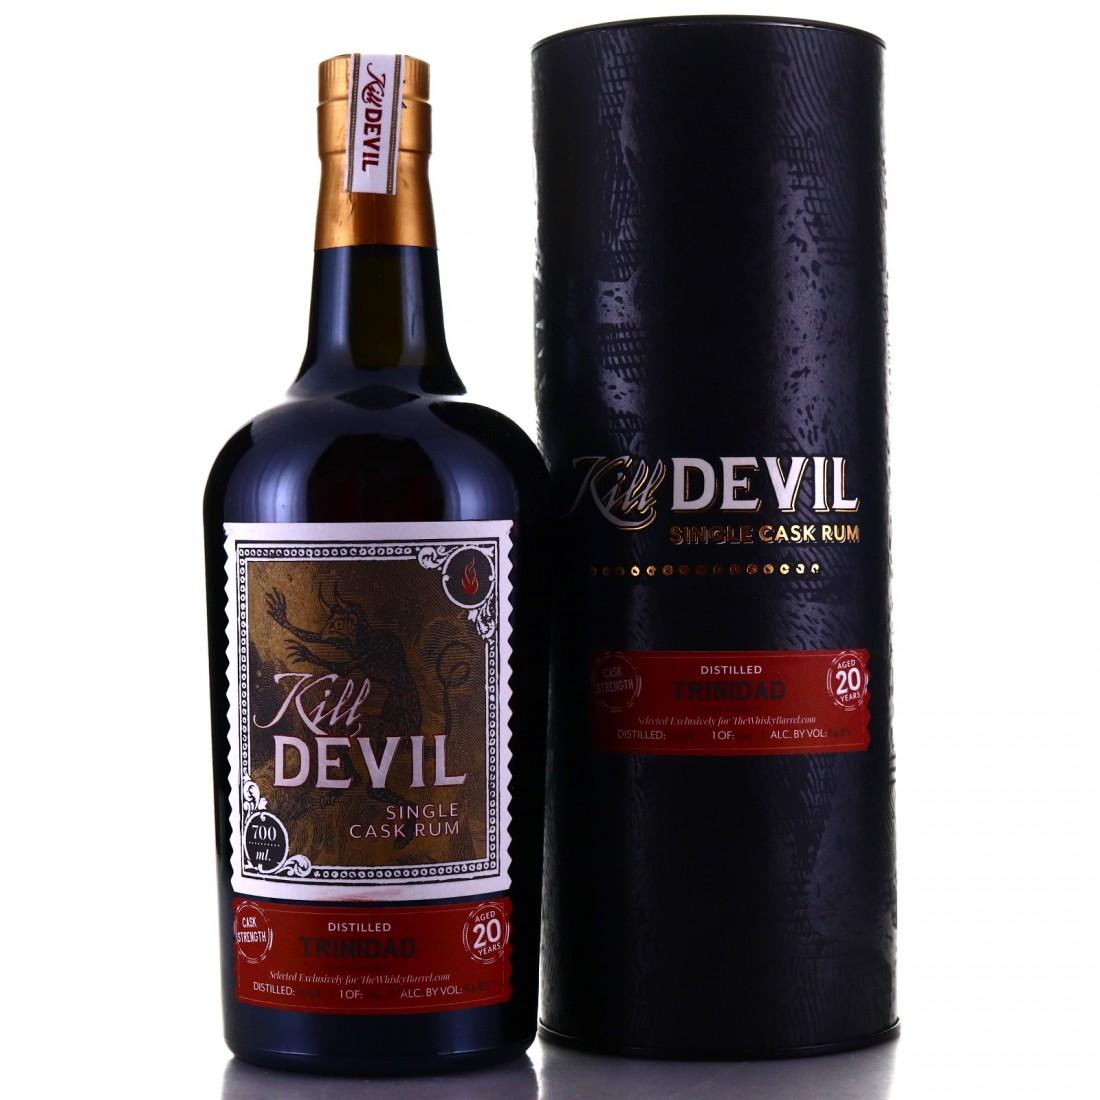 Caroni 1998 Kill Devil 20 Year Old